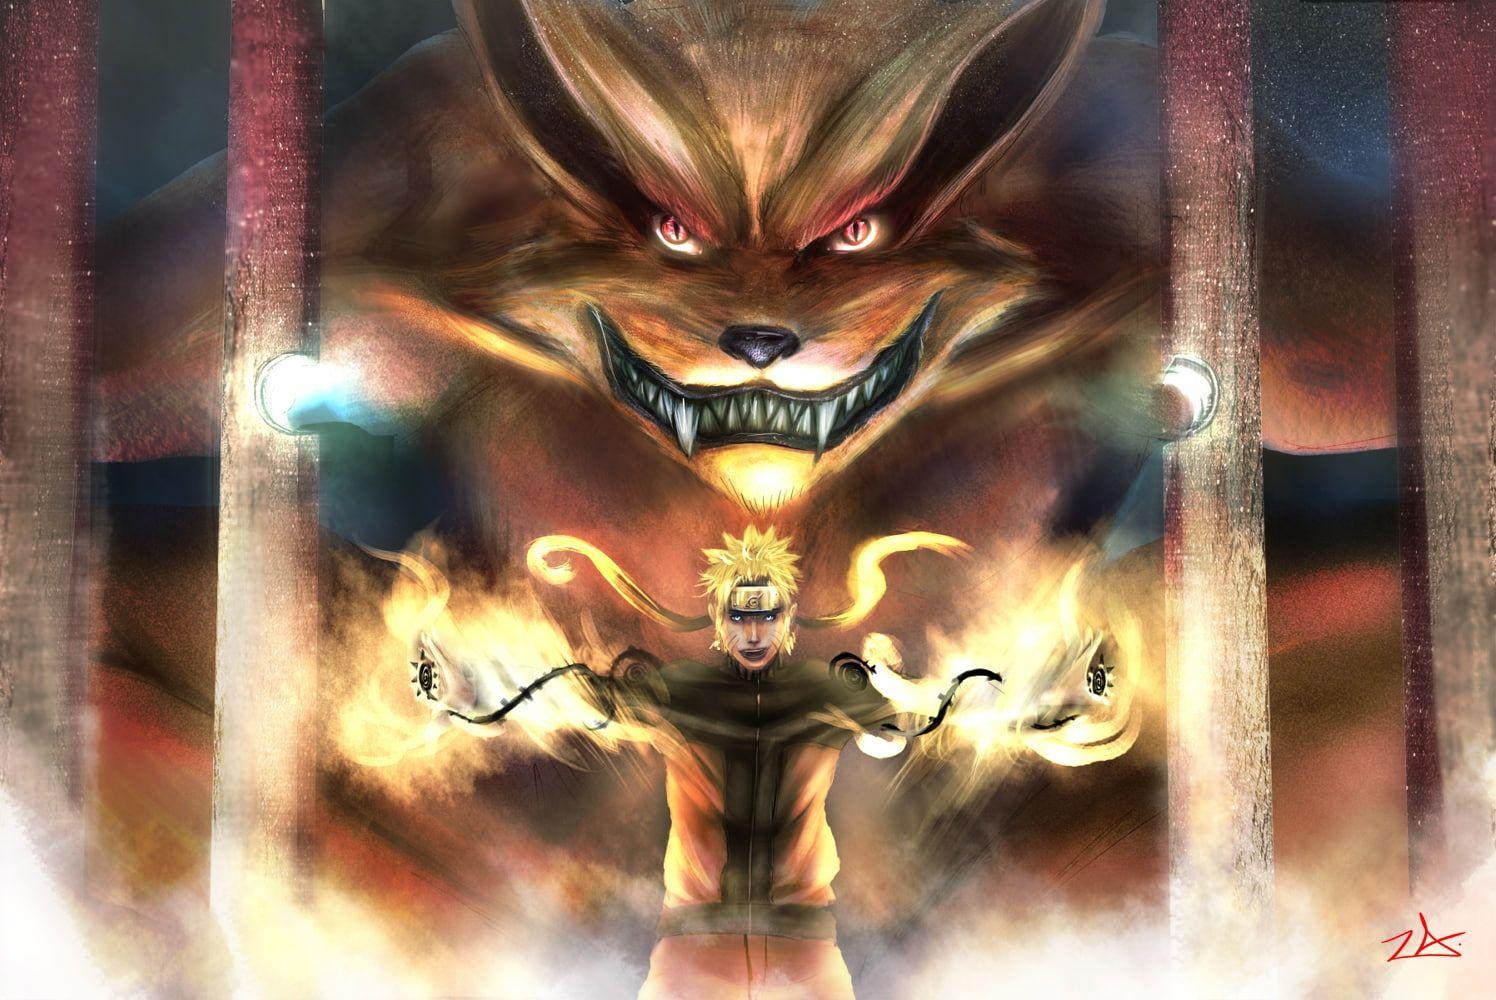 Chakra Creature Kyuubi Nine Tailed Fox Anime Naruto Hd Art Demon Creature Fangs Ears Chakra Fow 720p Wa Naruto Wallpaper Anime Images Anime Wallpaper